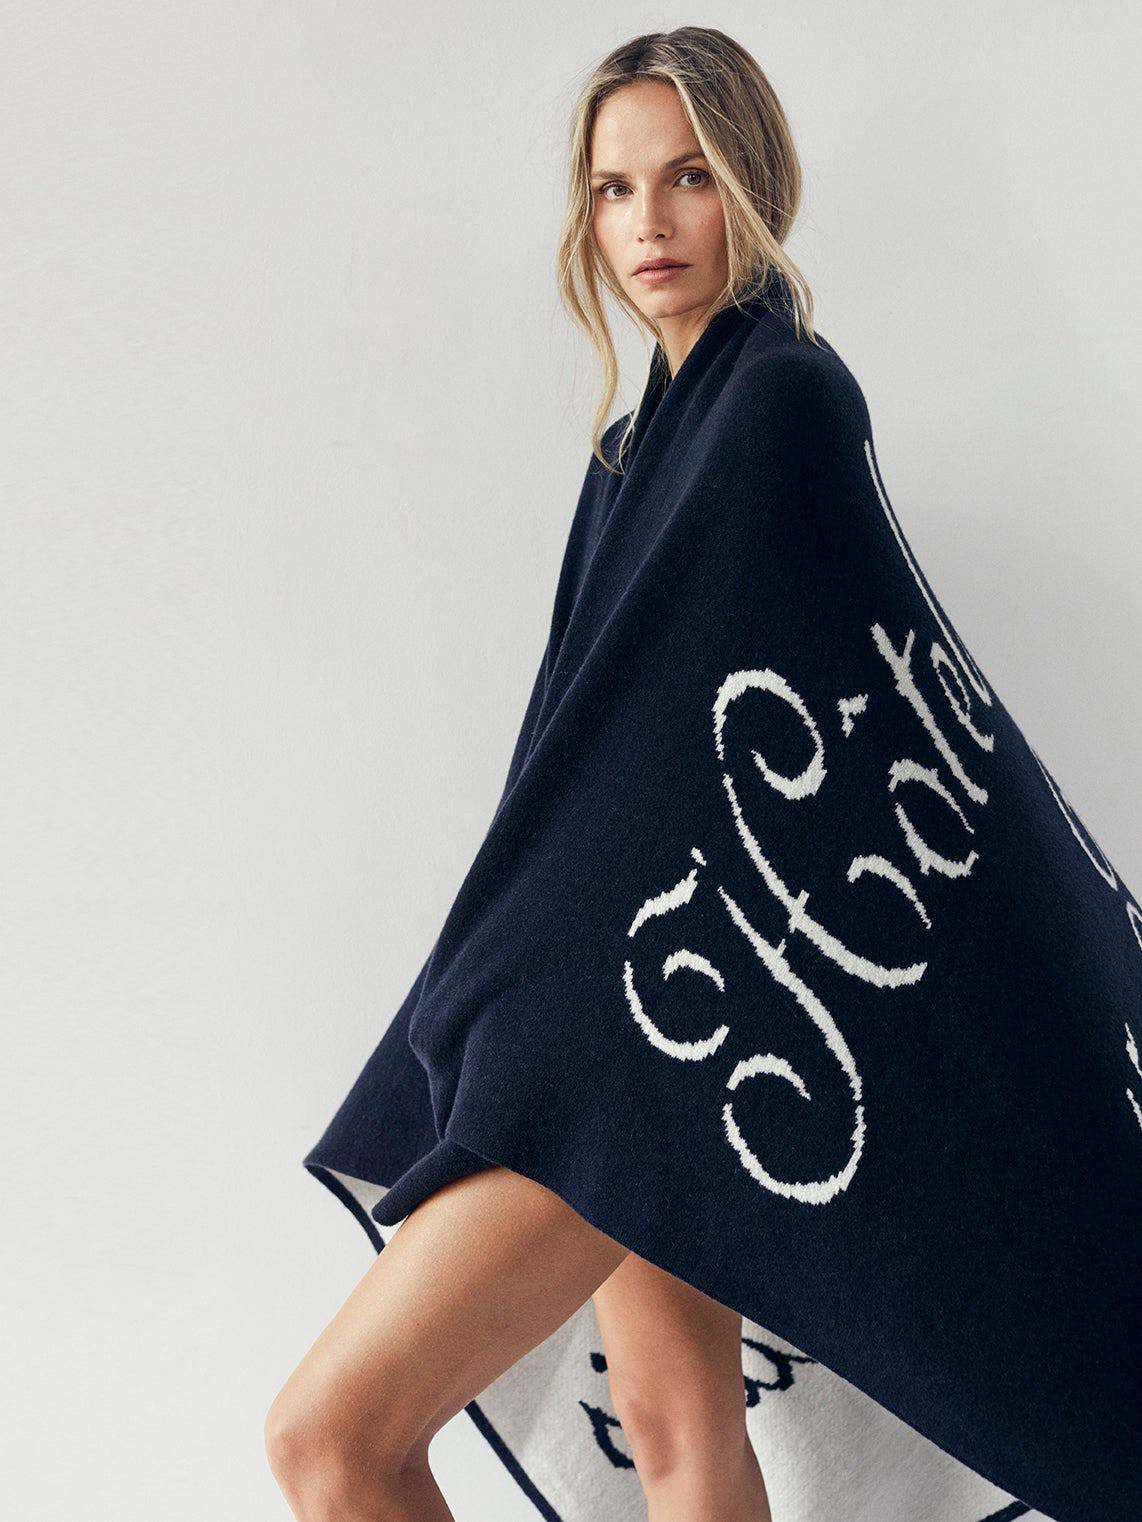 blanket on model side view